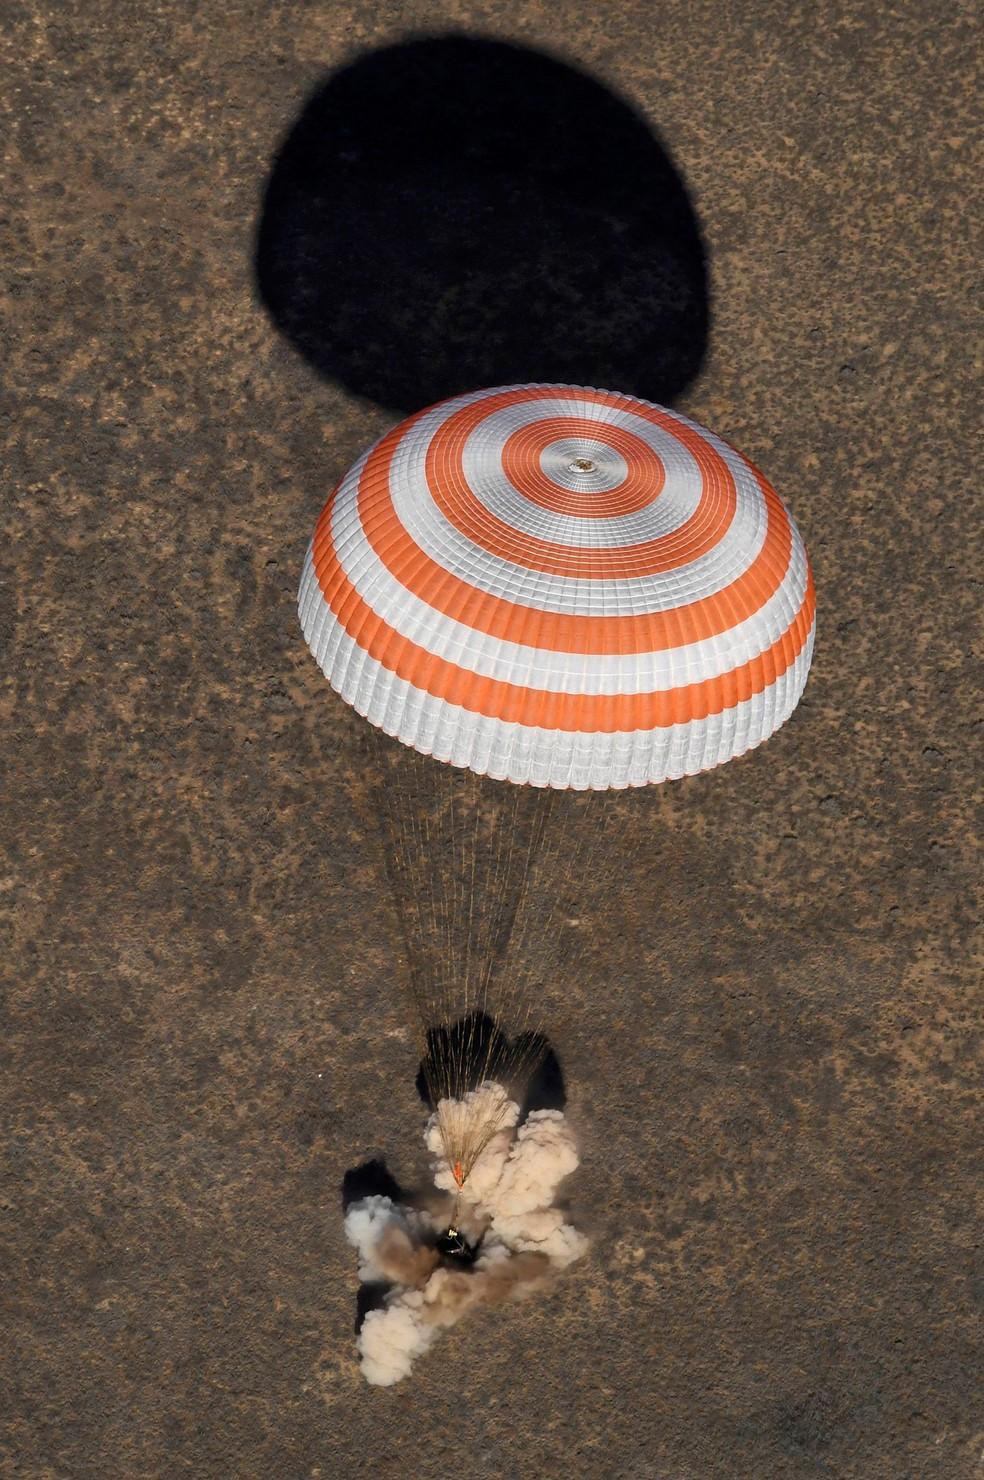 Cápsula espacial Soyuz MS-02 pousa no Cazaquistão nesta segunda-feira (Foto: REUTERS/Kirill Kudryavtsev/Pool)